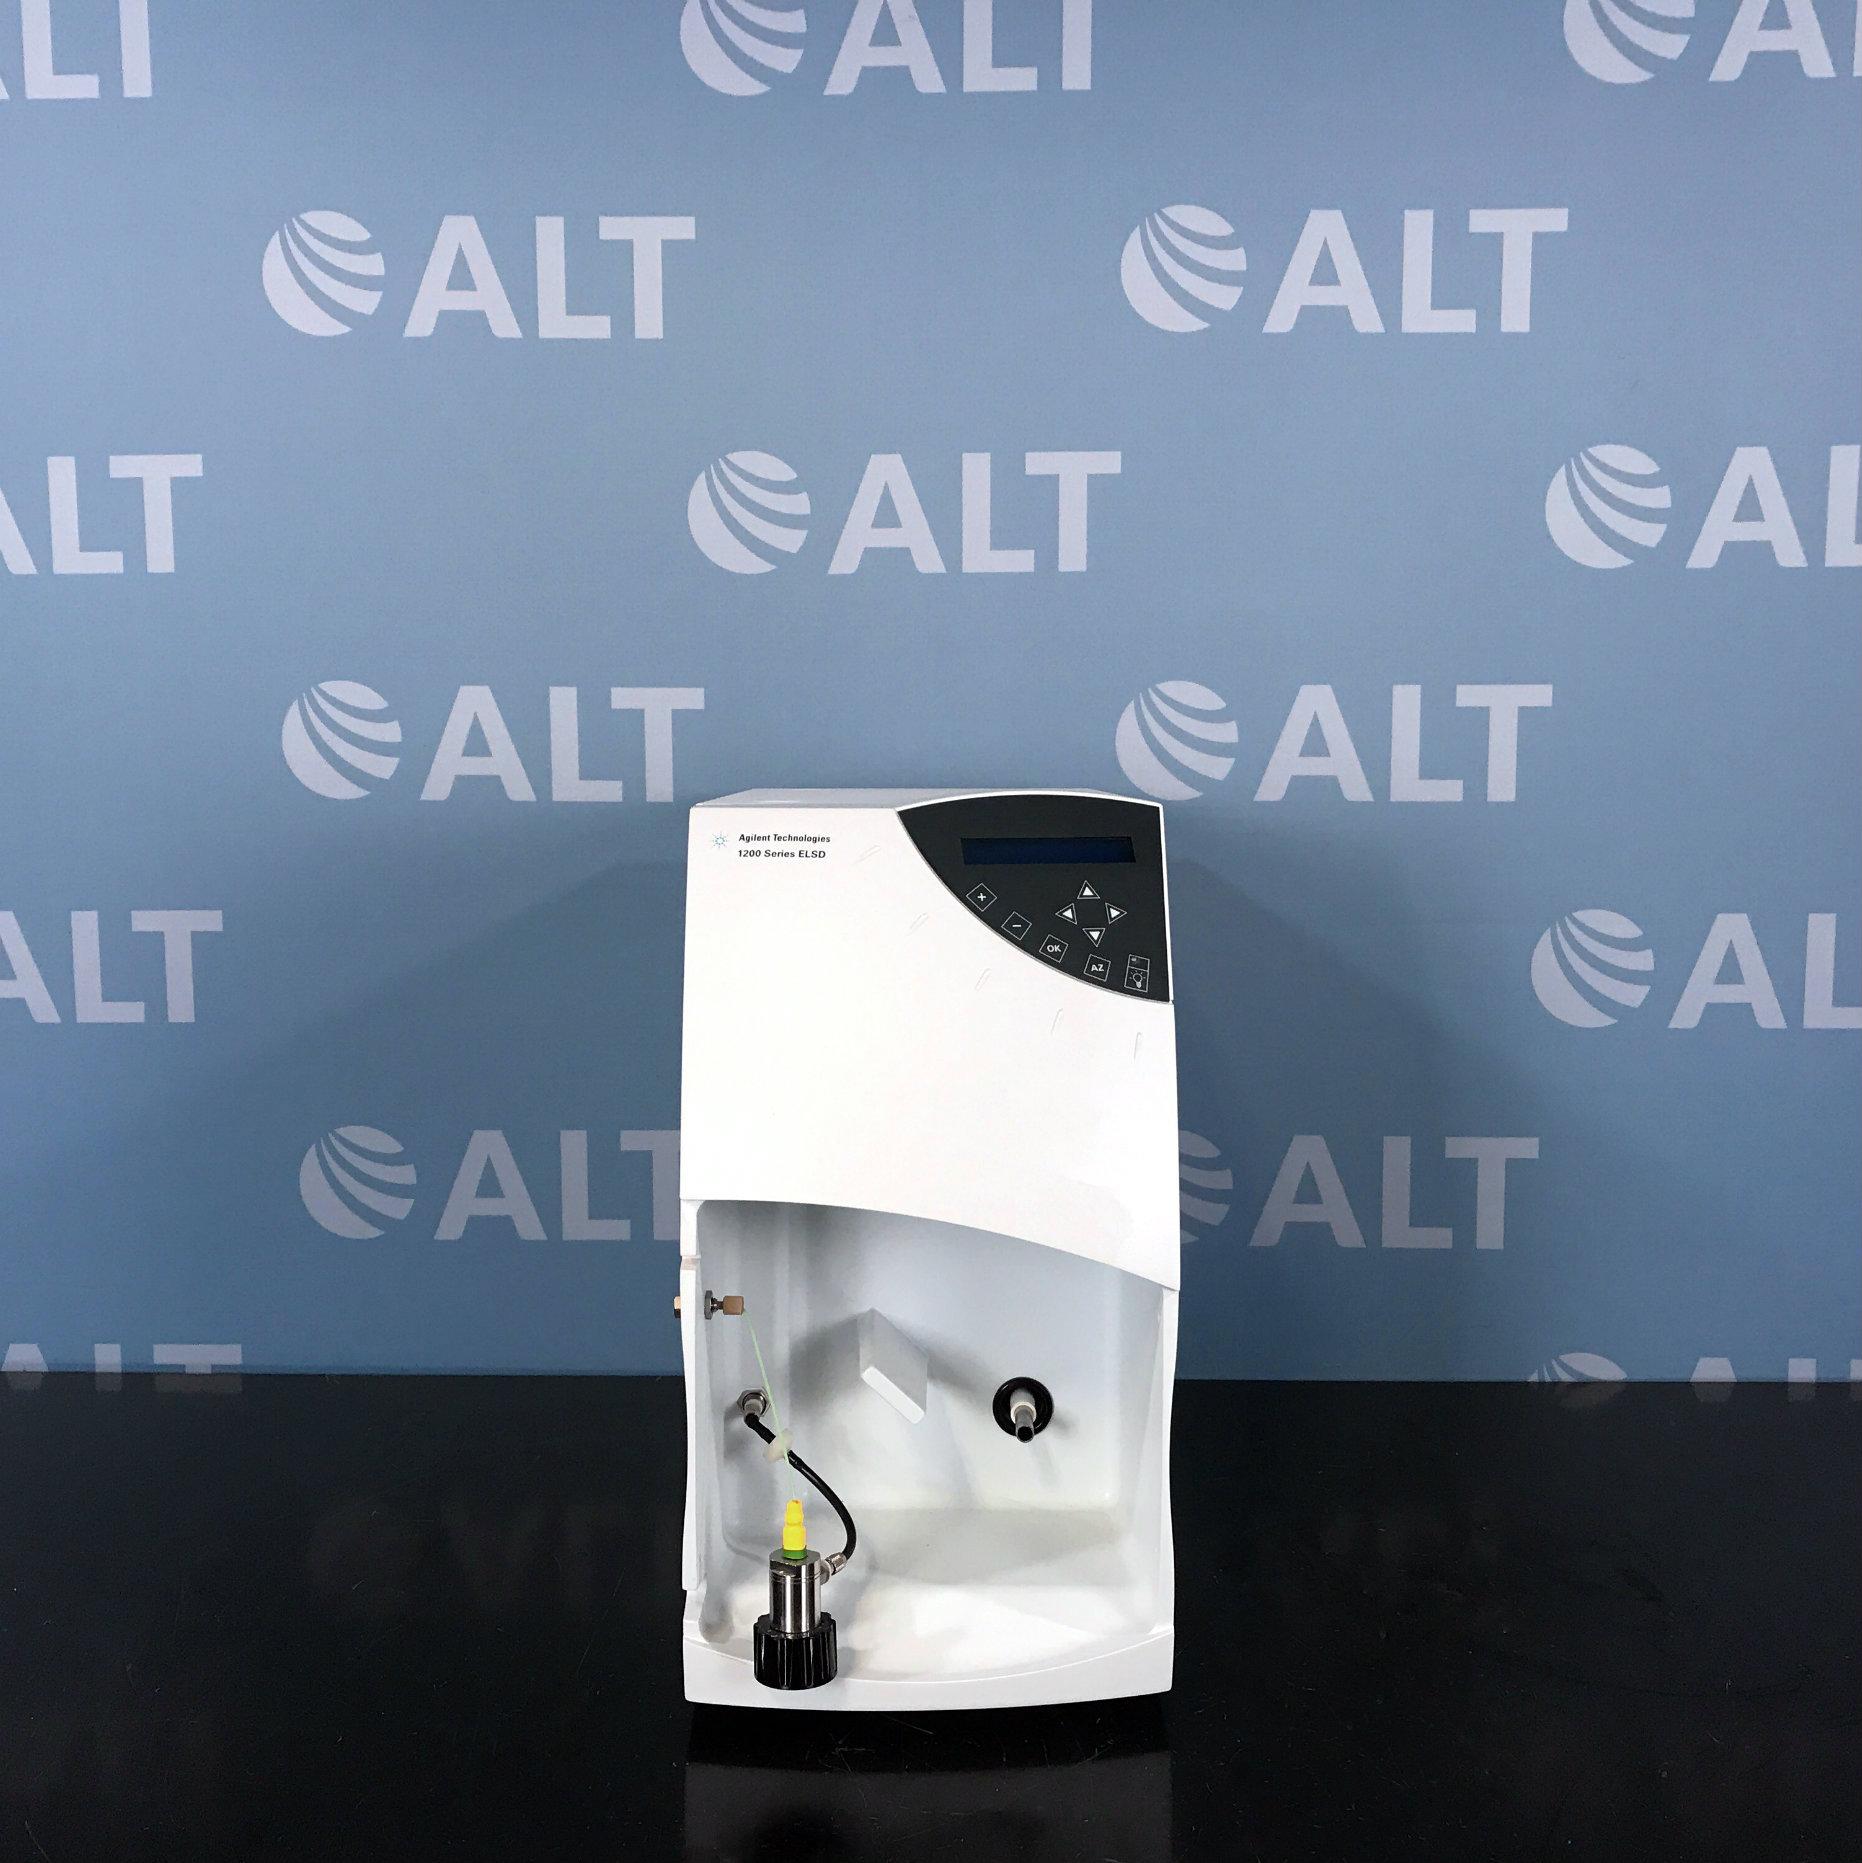 Agilent Technologies 1200 Series (G4218A) Evaporative Light Scattering Detector (ELSD) Image